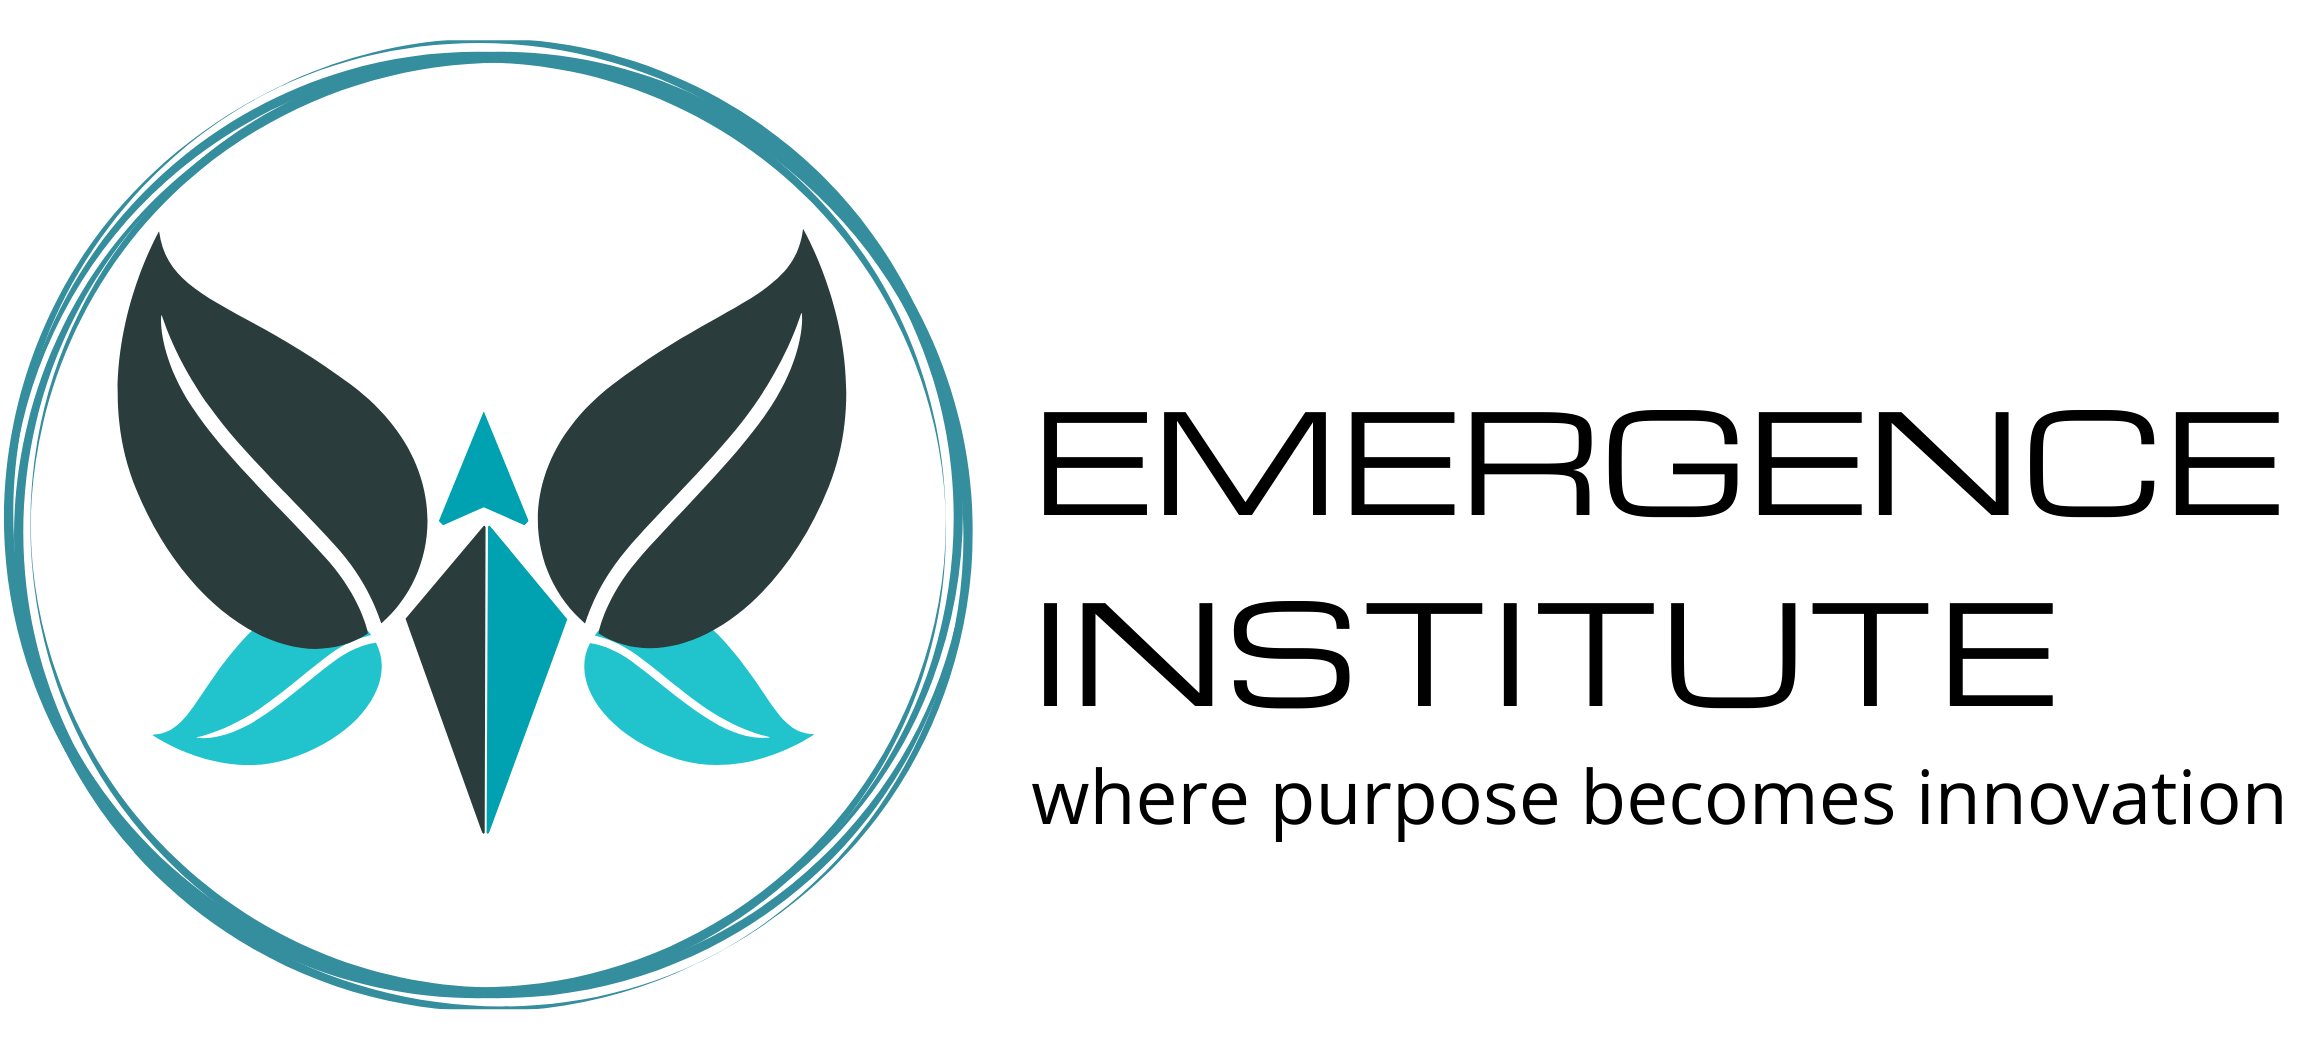 EI-update-Logo-ozq8p2rl86ktabrpscslhuzhgccvrtqjxwrxj3aqgw-1-e1618490676307 (1)